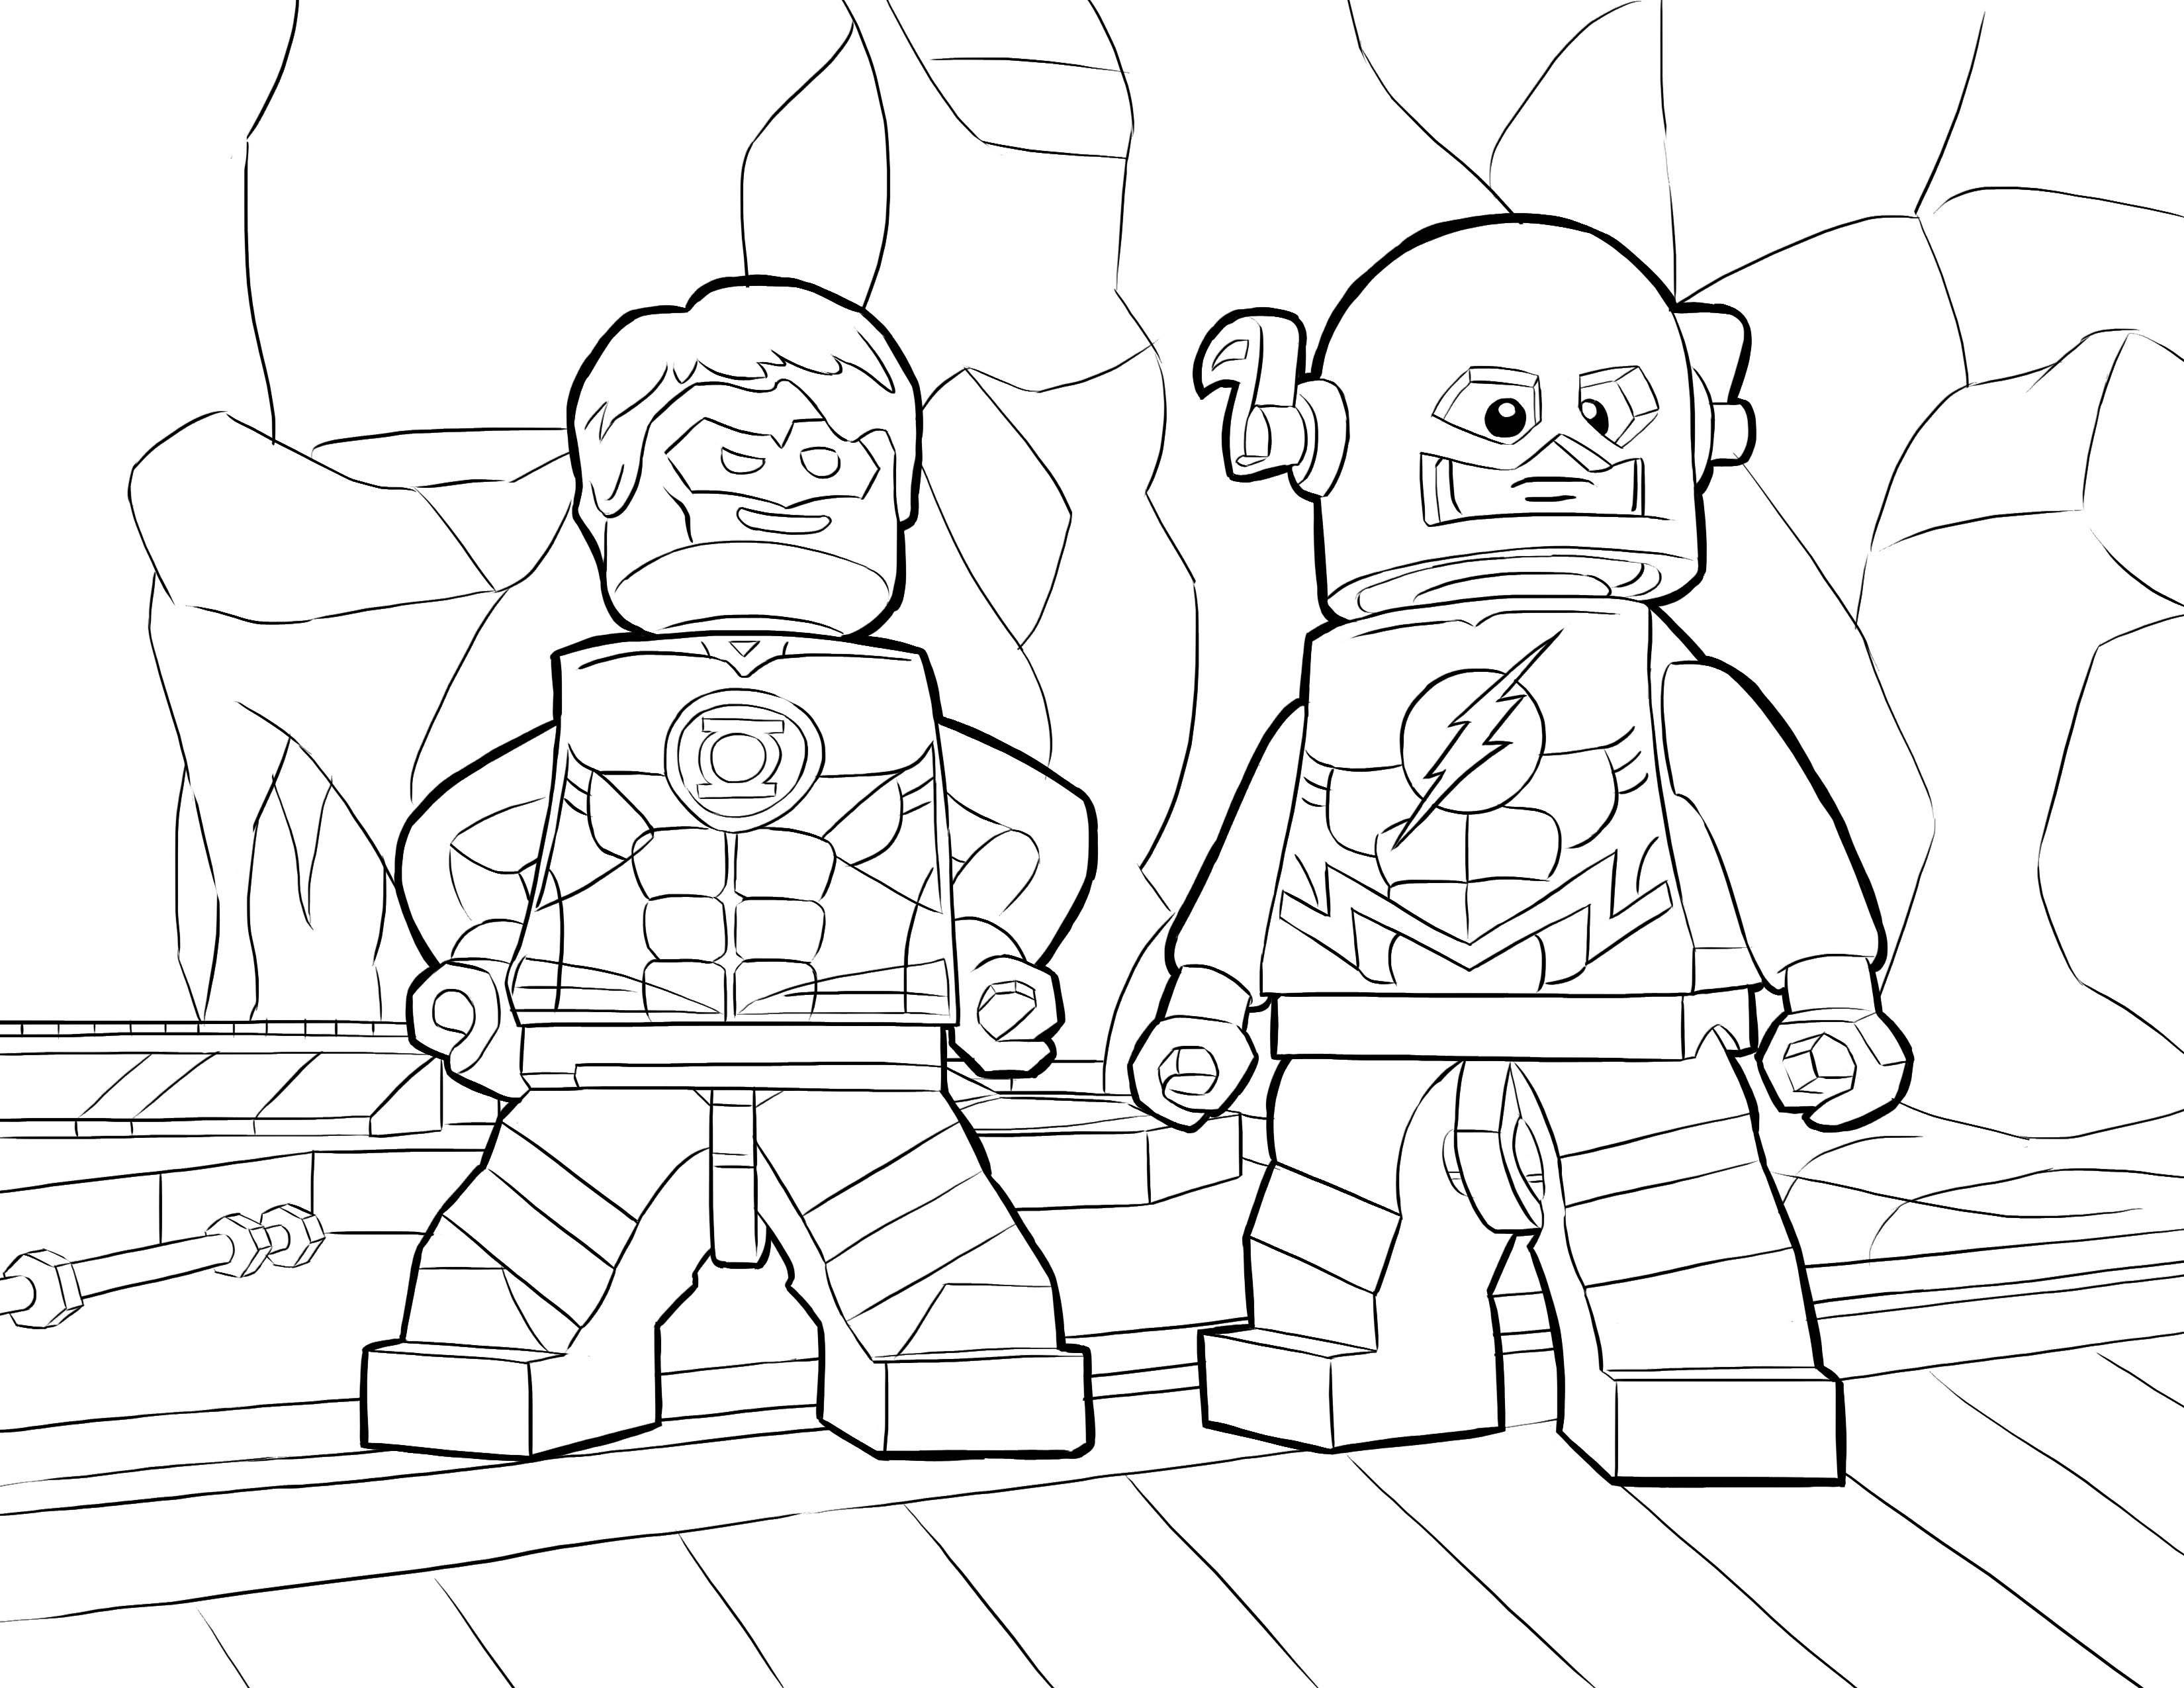 Desenho De The Flash Lego Para Colorir Tudodesenhos